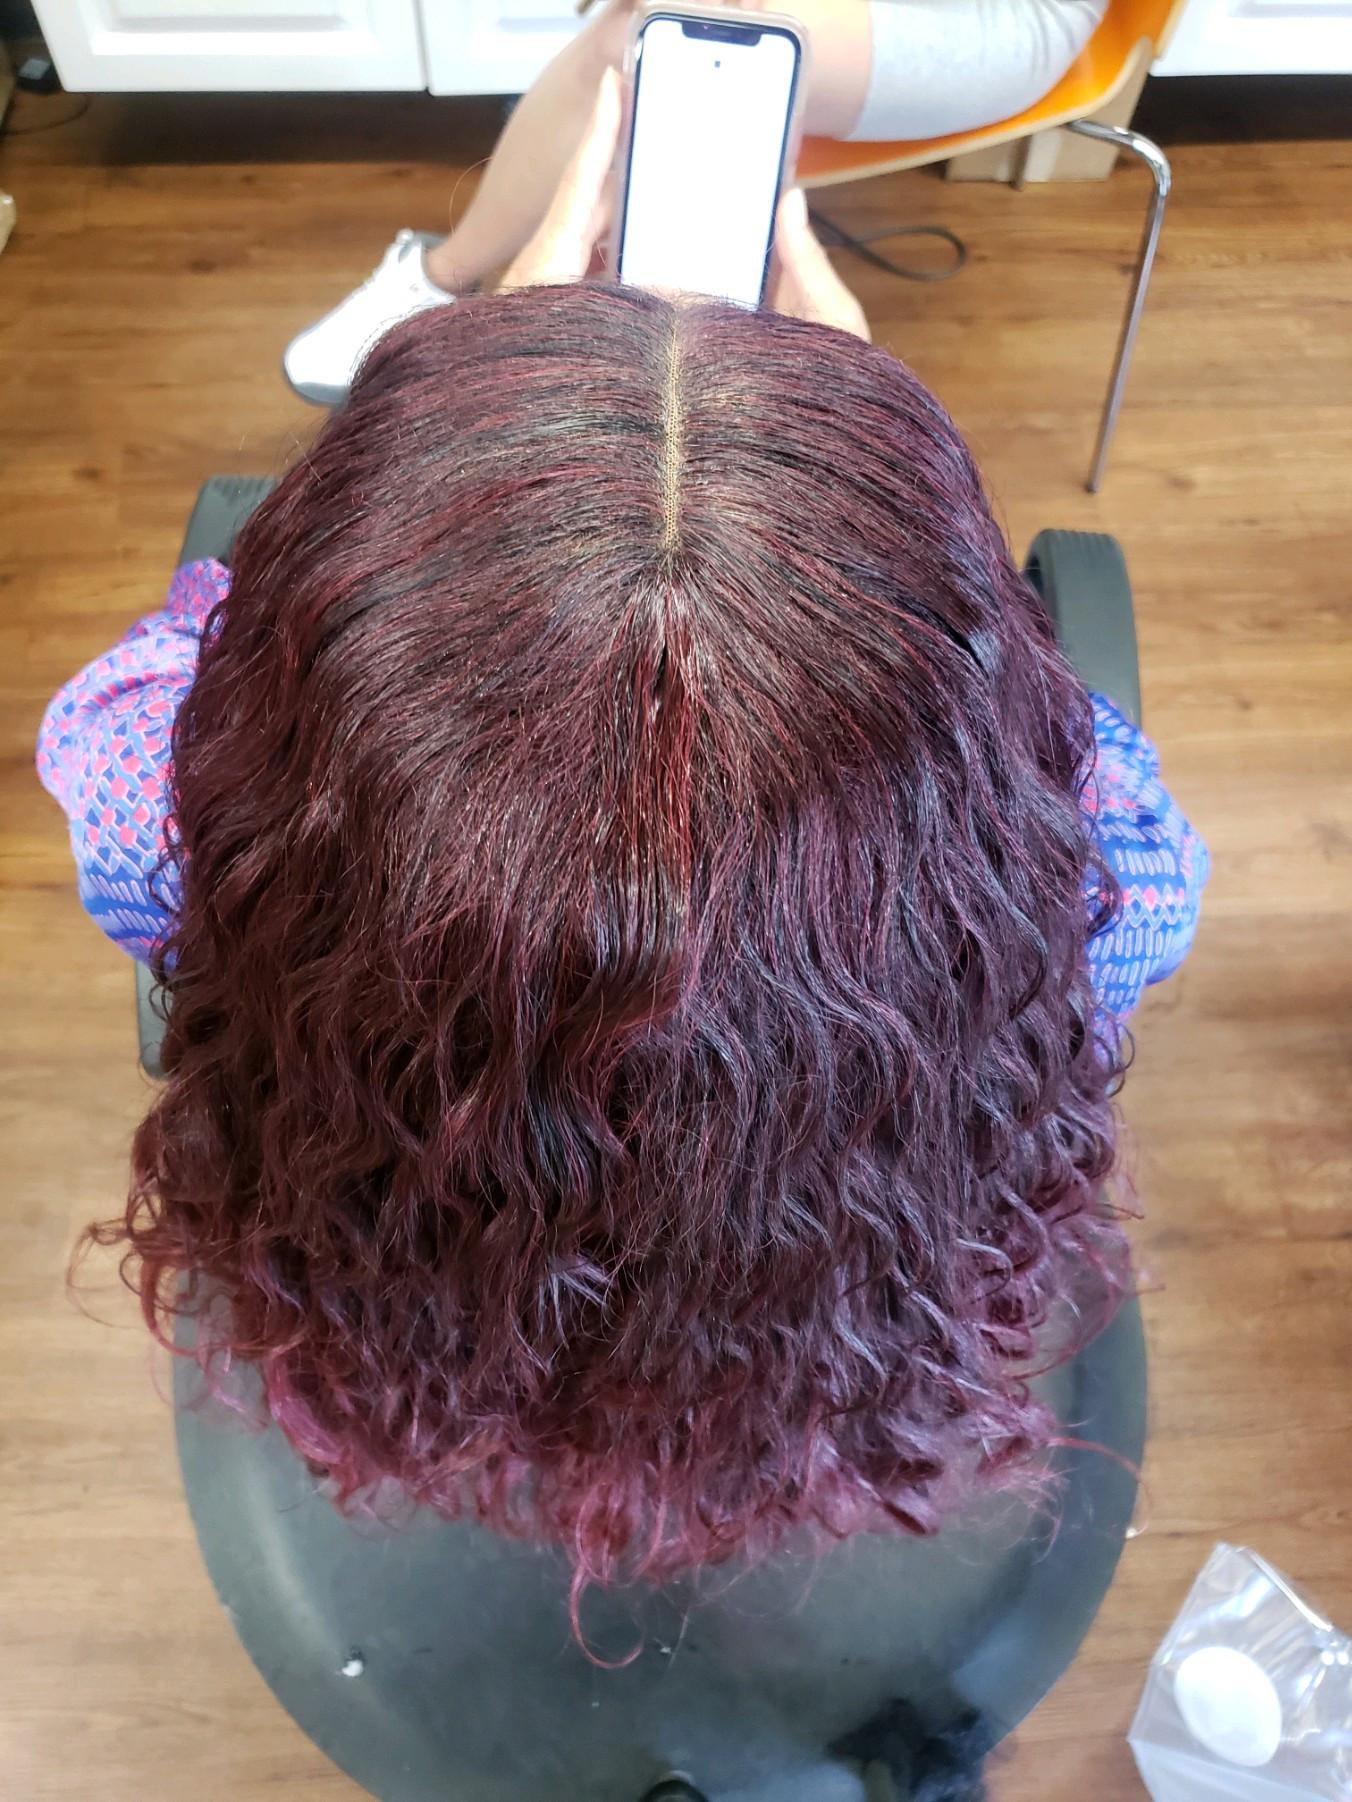 Wig install - sew in (no glue)